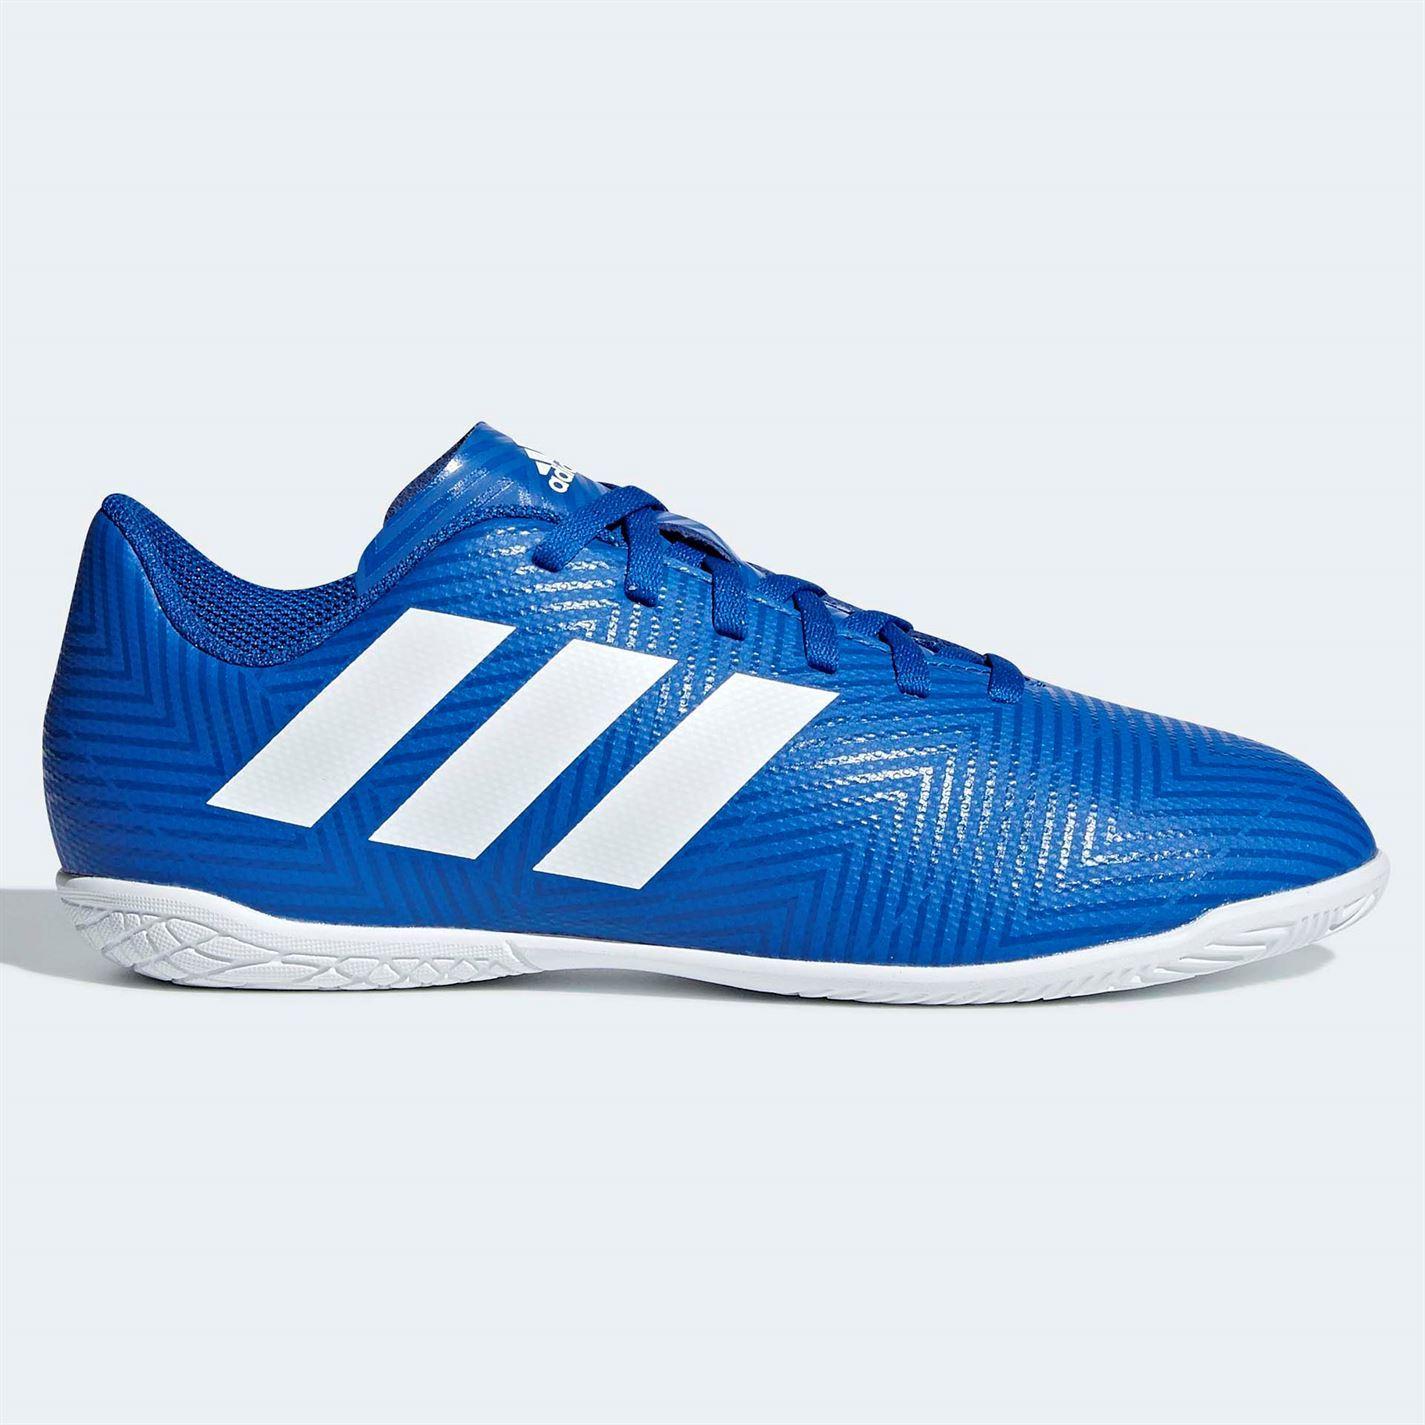 Details about adidas Nemeziz Tango 18.4 Indoor Football Trainers Juniors Blue Soccer Shoes